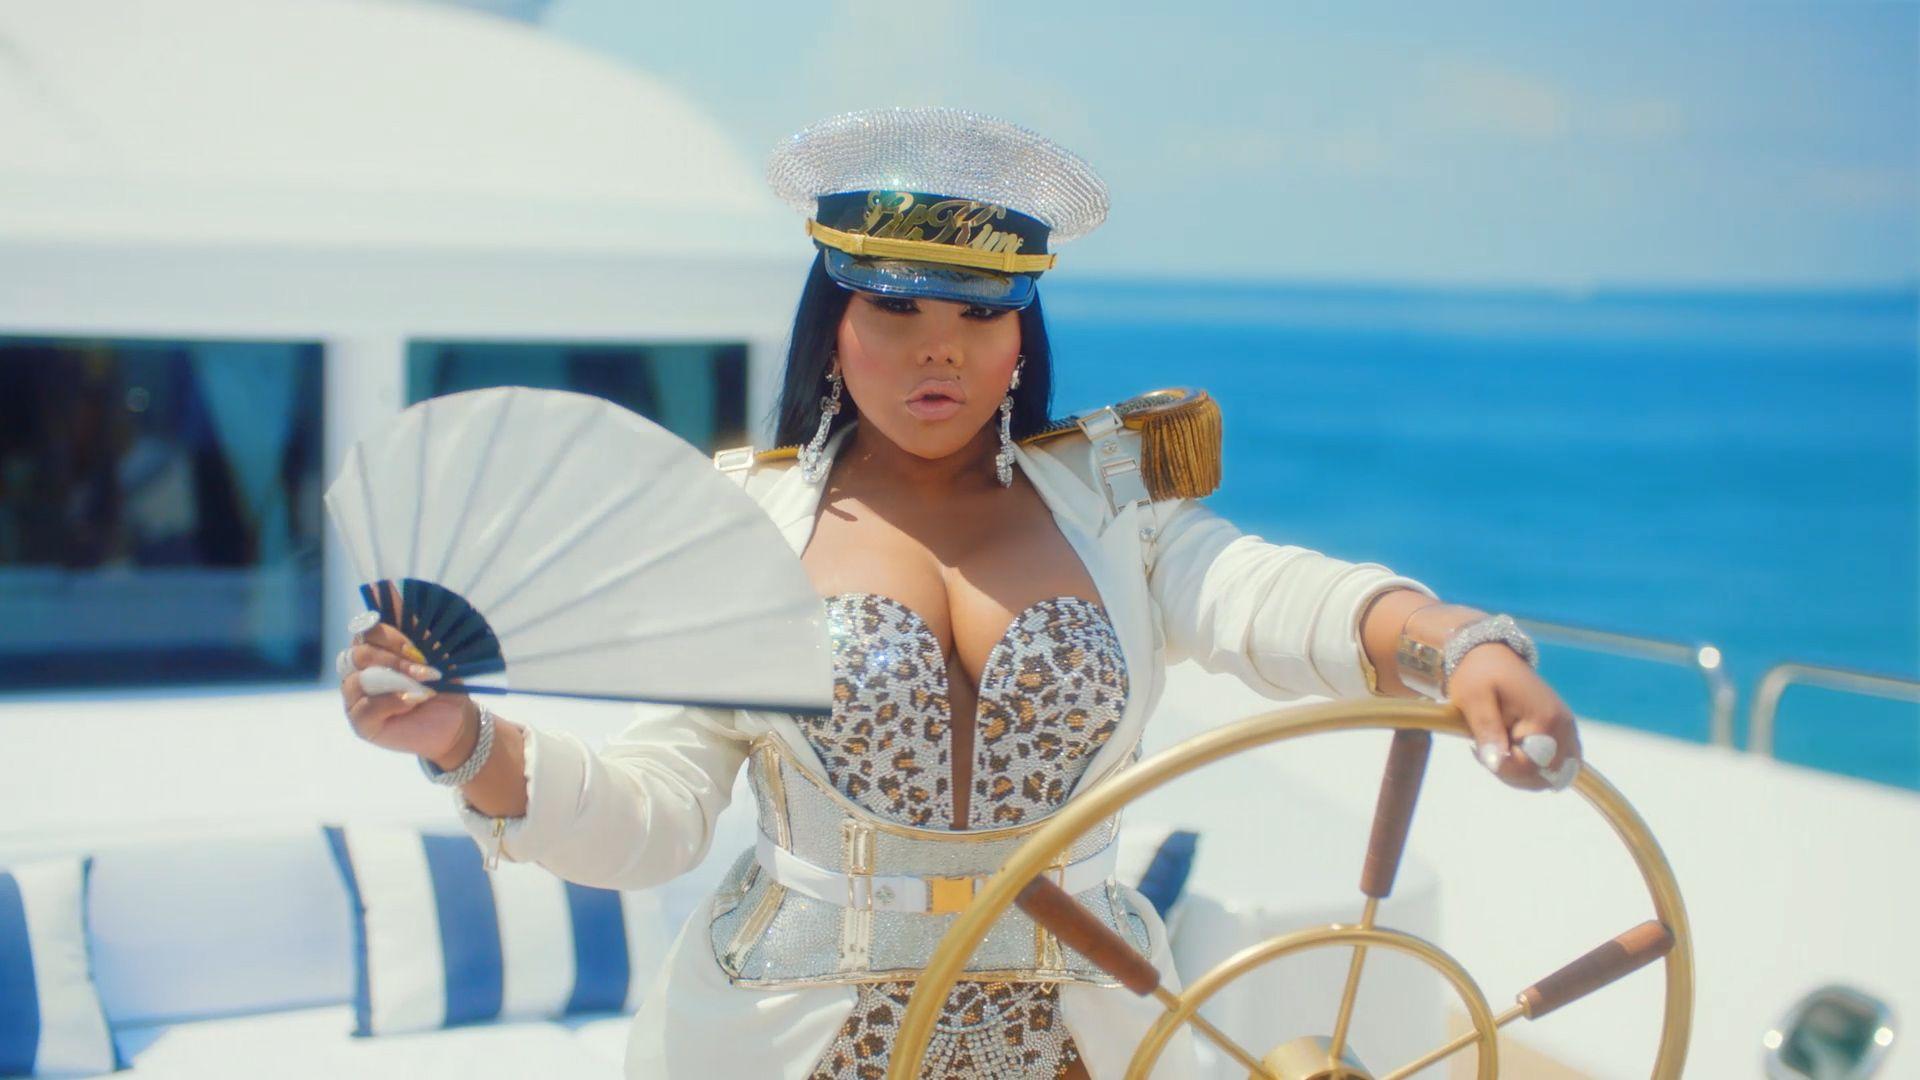 Sea, Slay, Love on the Girls Cruise - Girls Cruise (Video Clip) | VH1